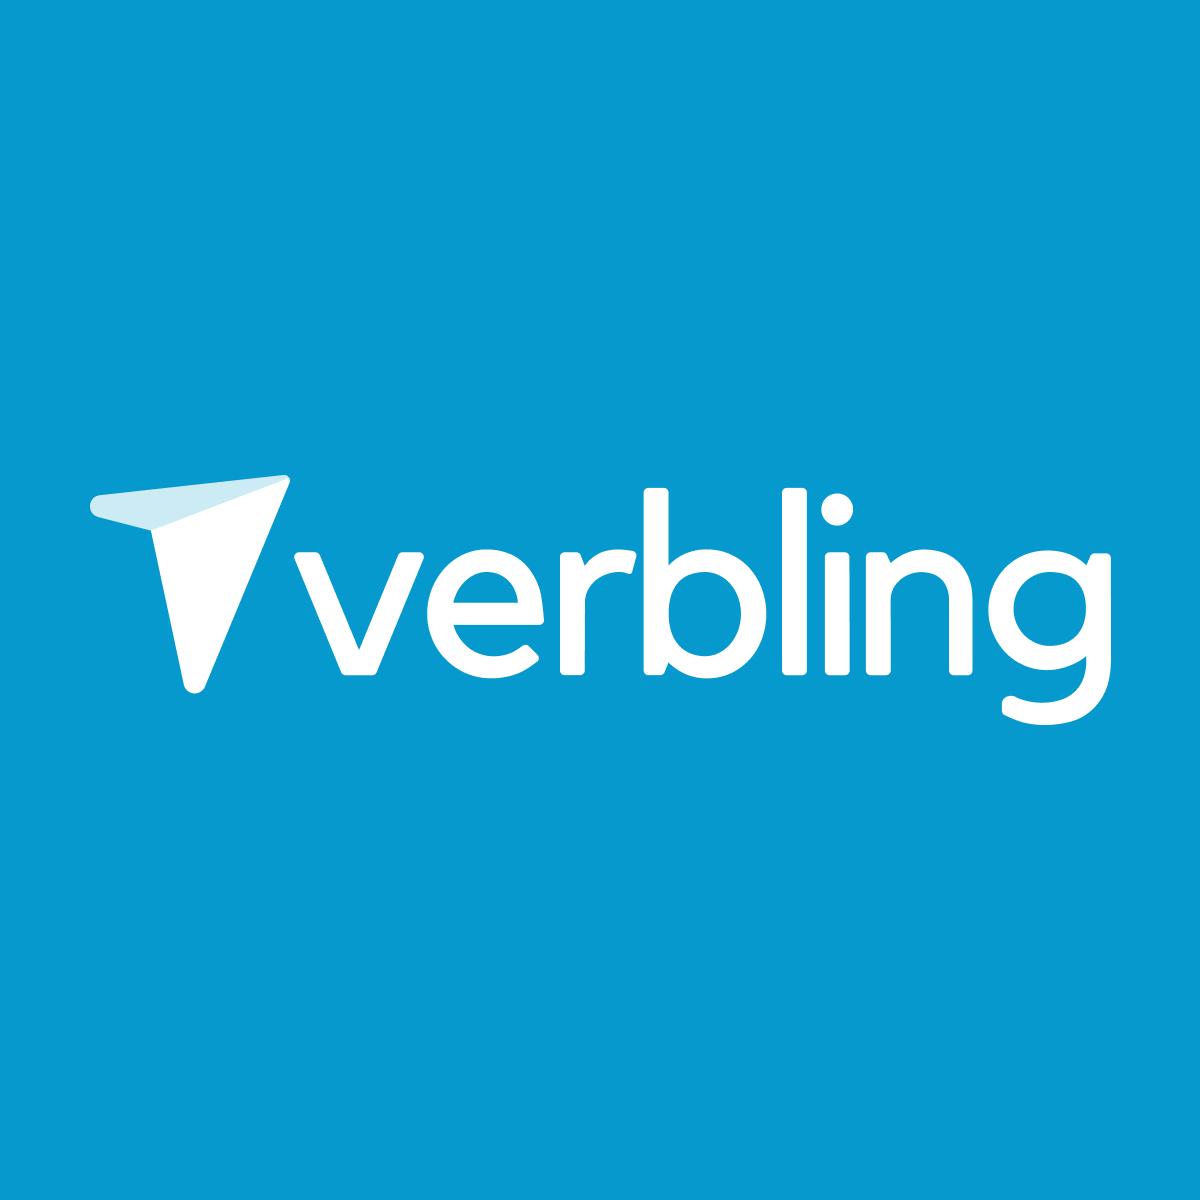 es.verbling.com